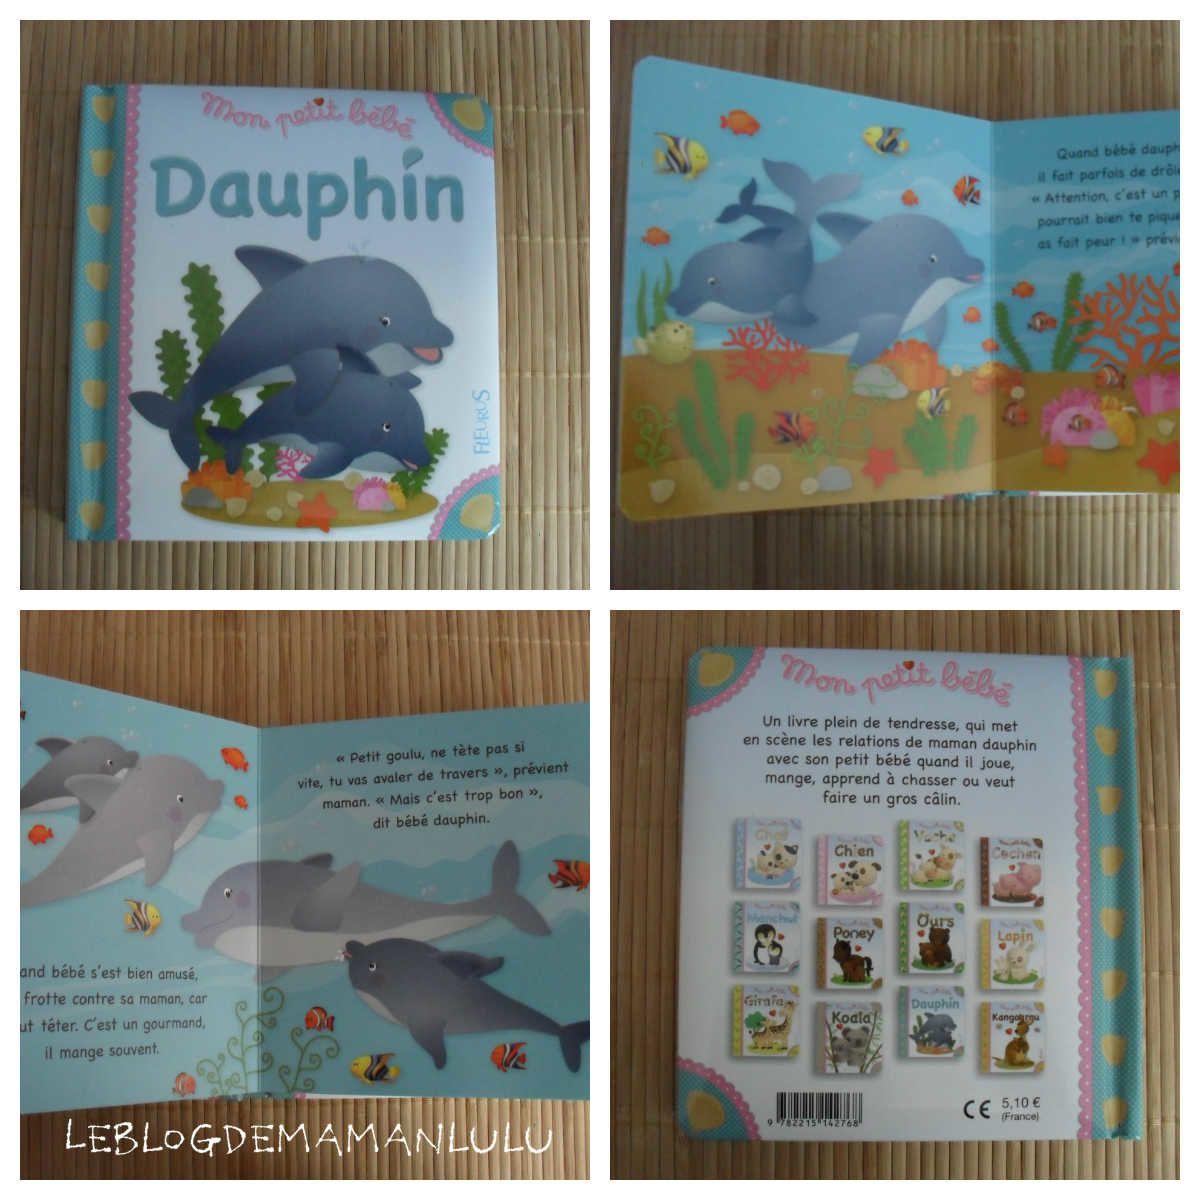 Douceur et Tendresse avec Le dauphin {#Chutlesenfantslisent}{#Test}{#Fleurus}